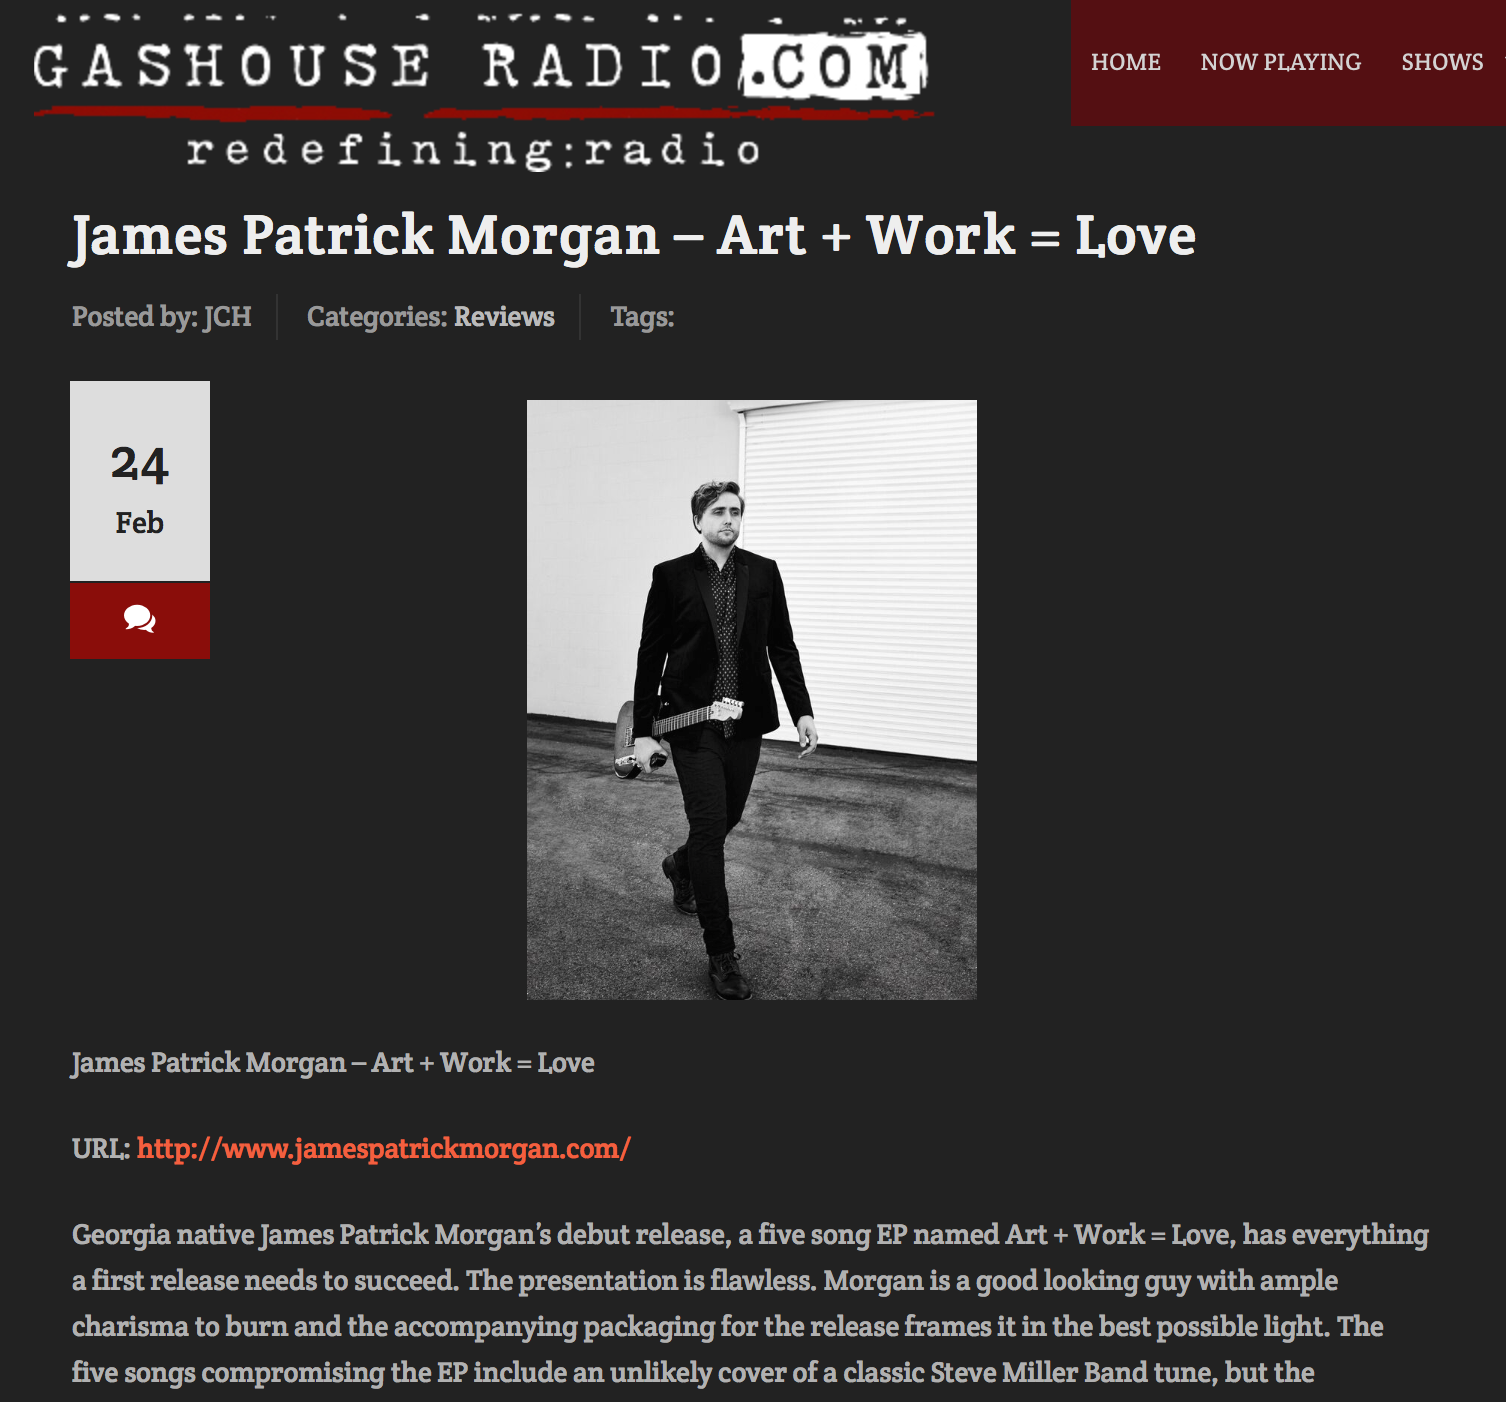 JPM-GashouseRadio(EP)